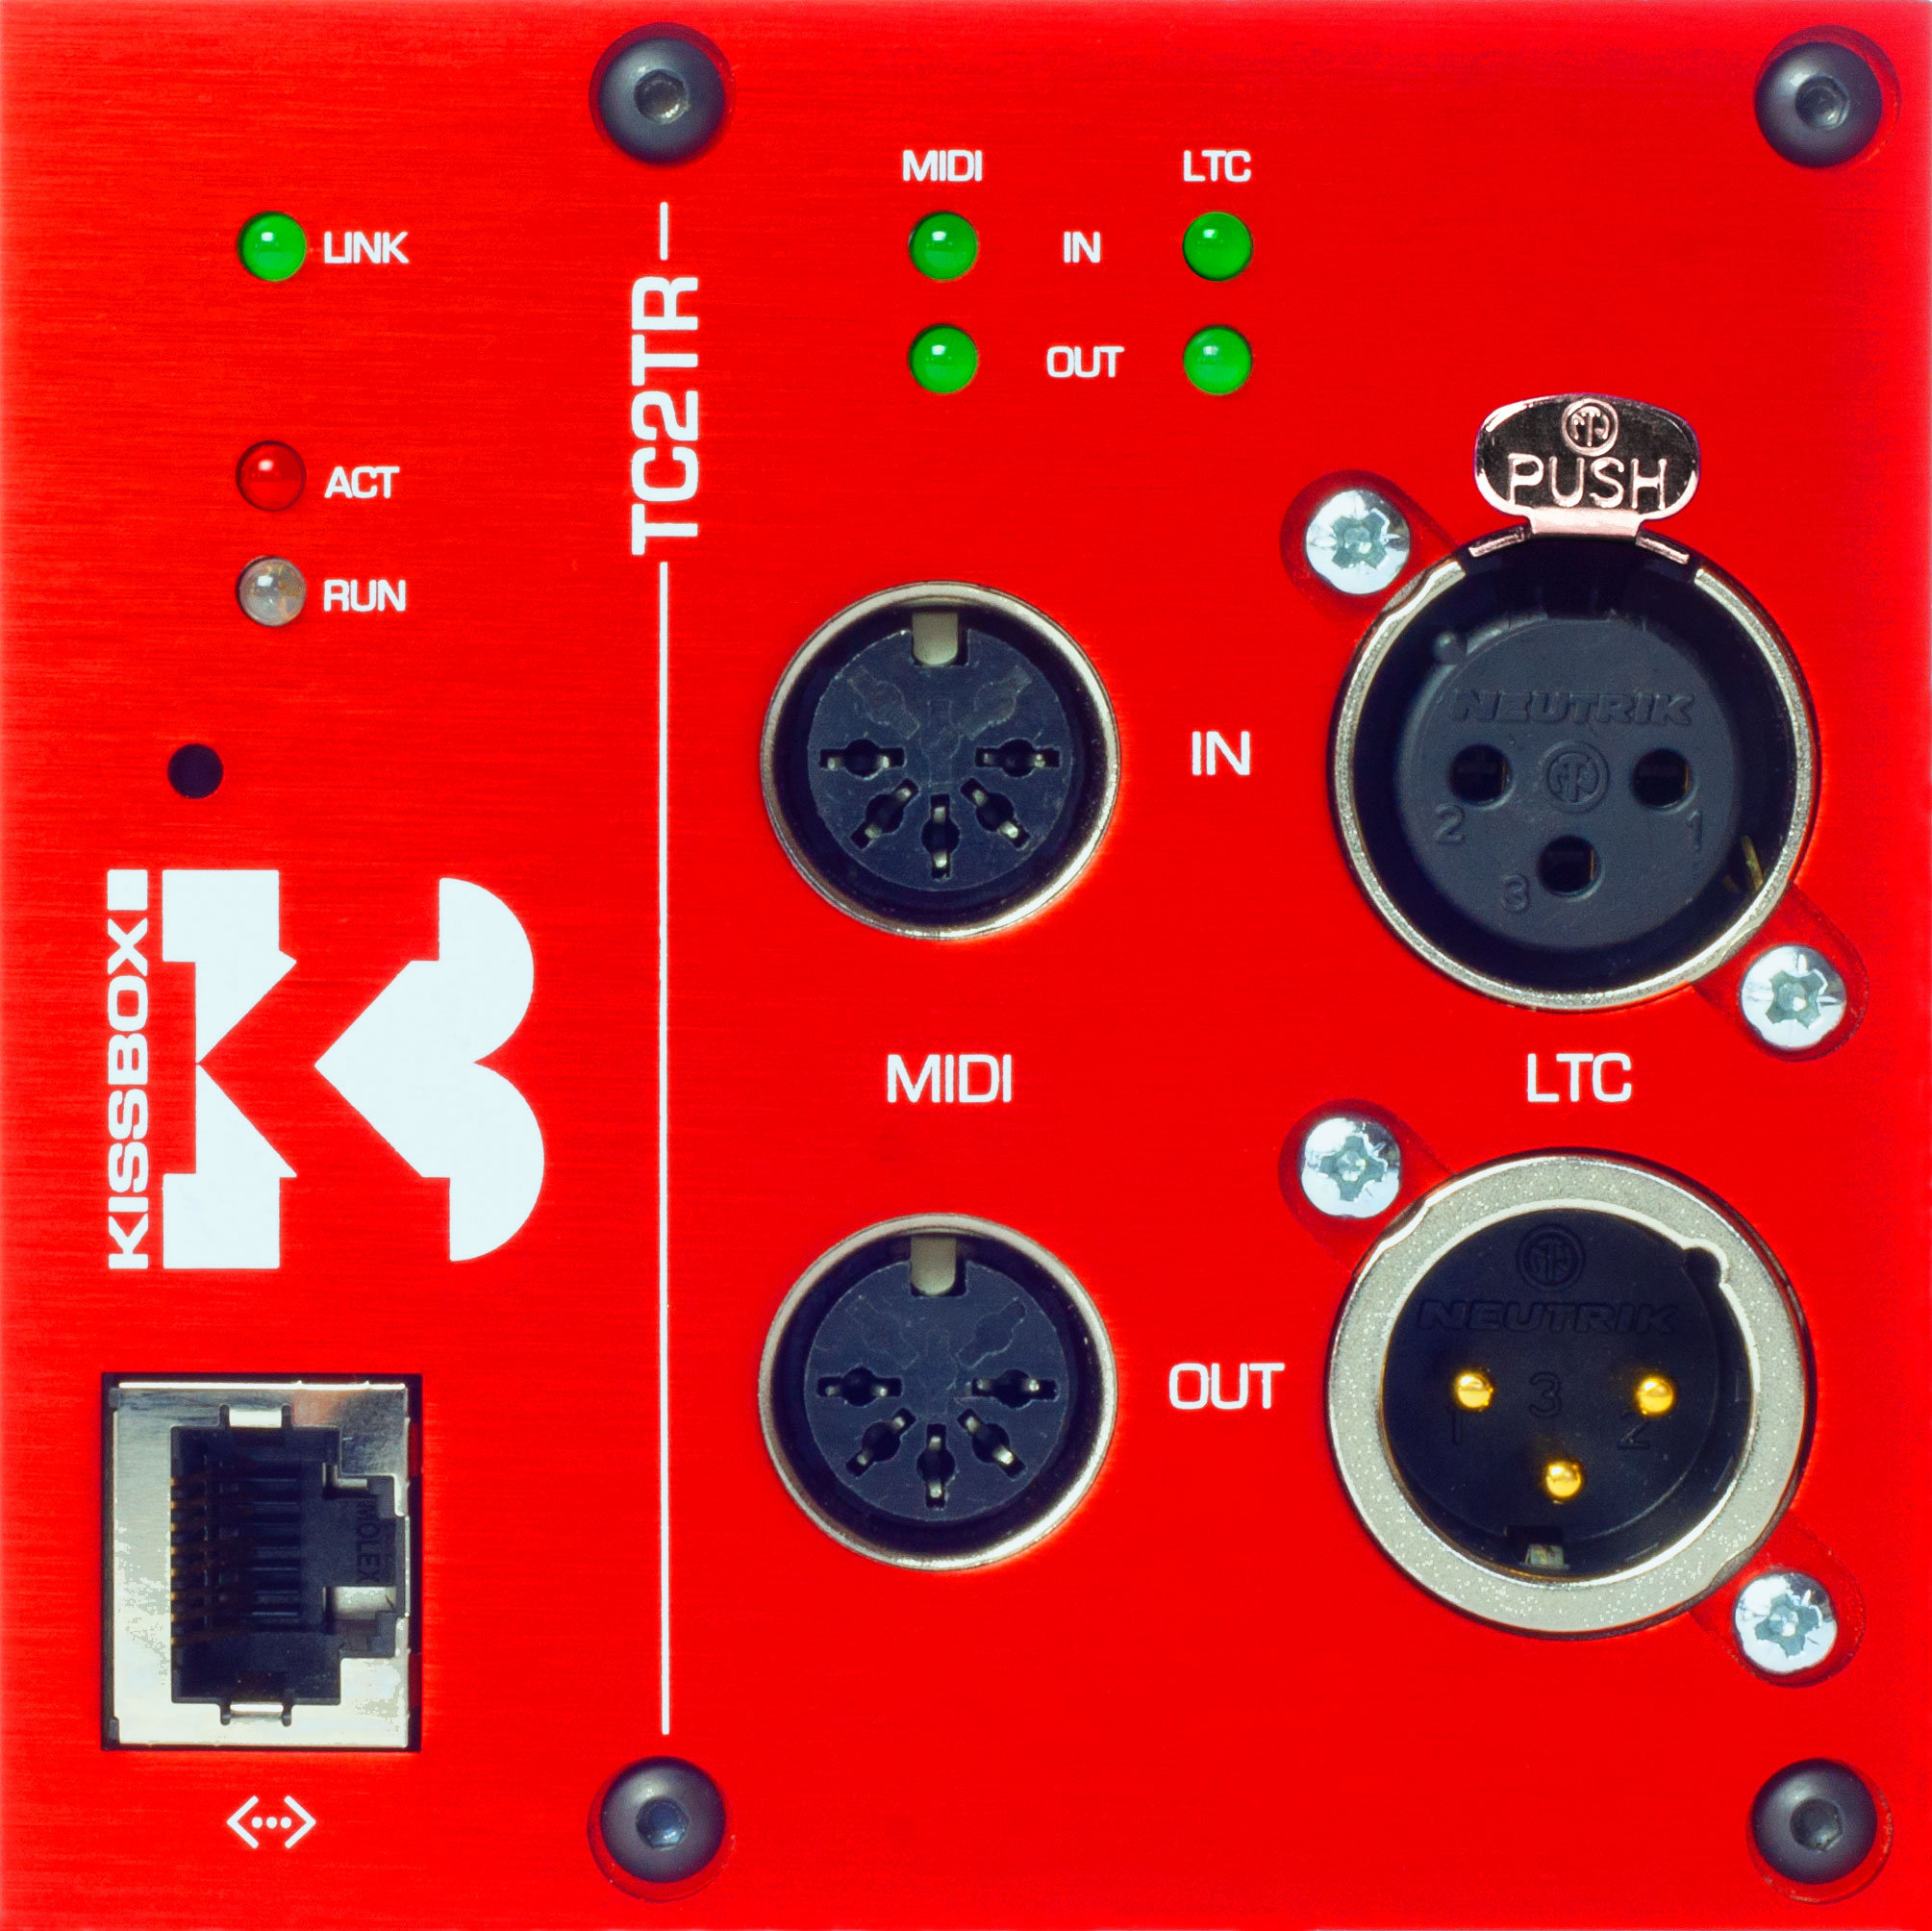 TC2TR LTC & MTC/MIDI Transceiver